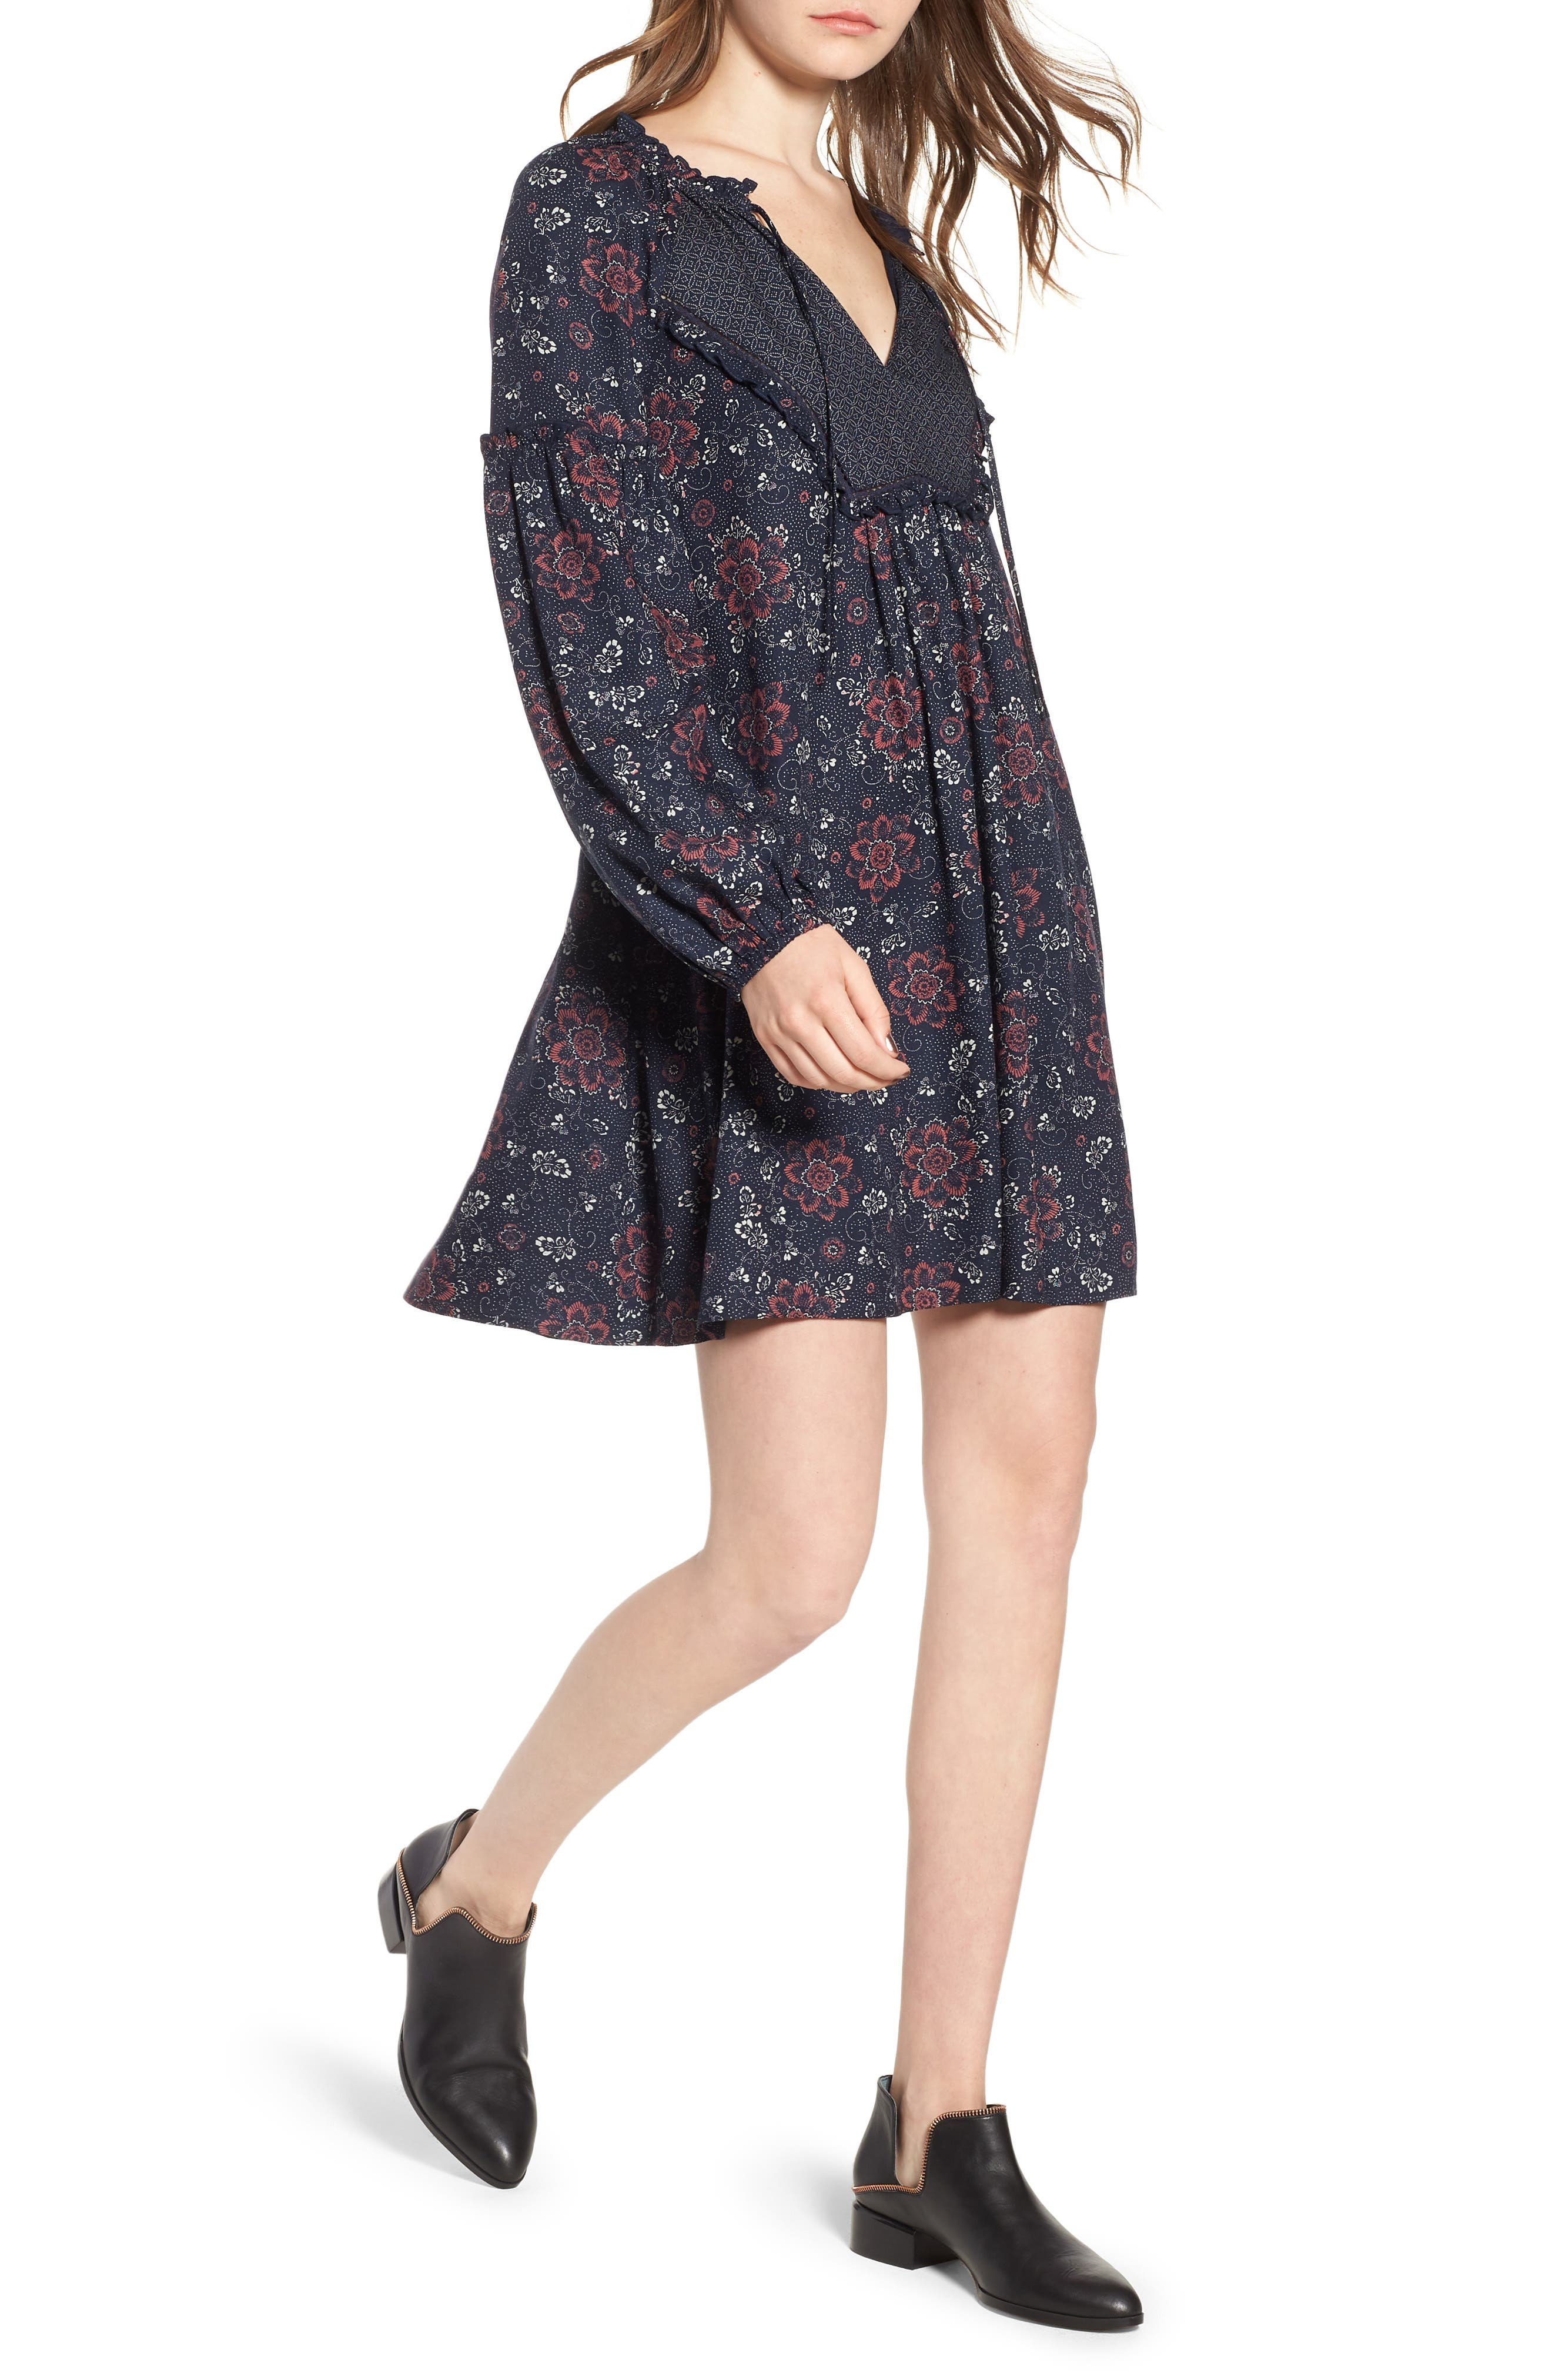 Mix Print Peasant Dress,                         Main,                         color, NAVY NIGHT WOVEN FLORAL MIX